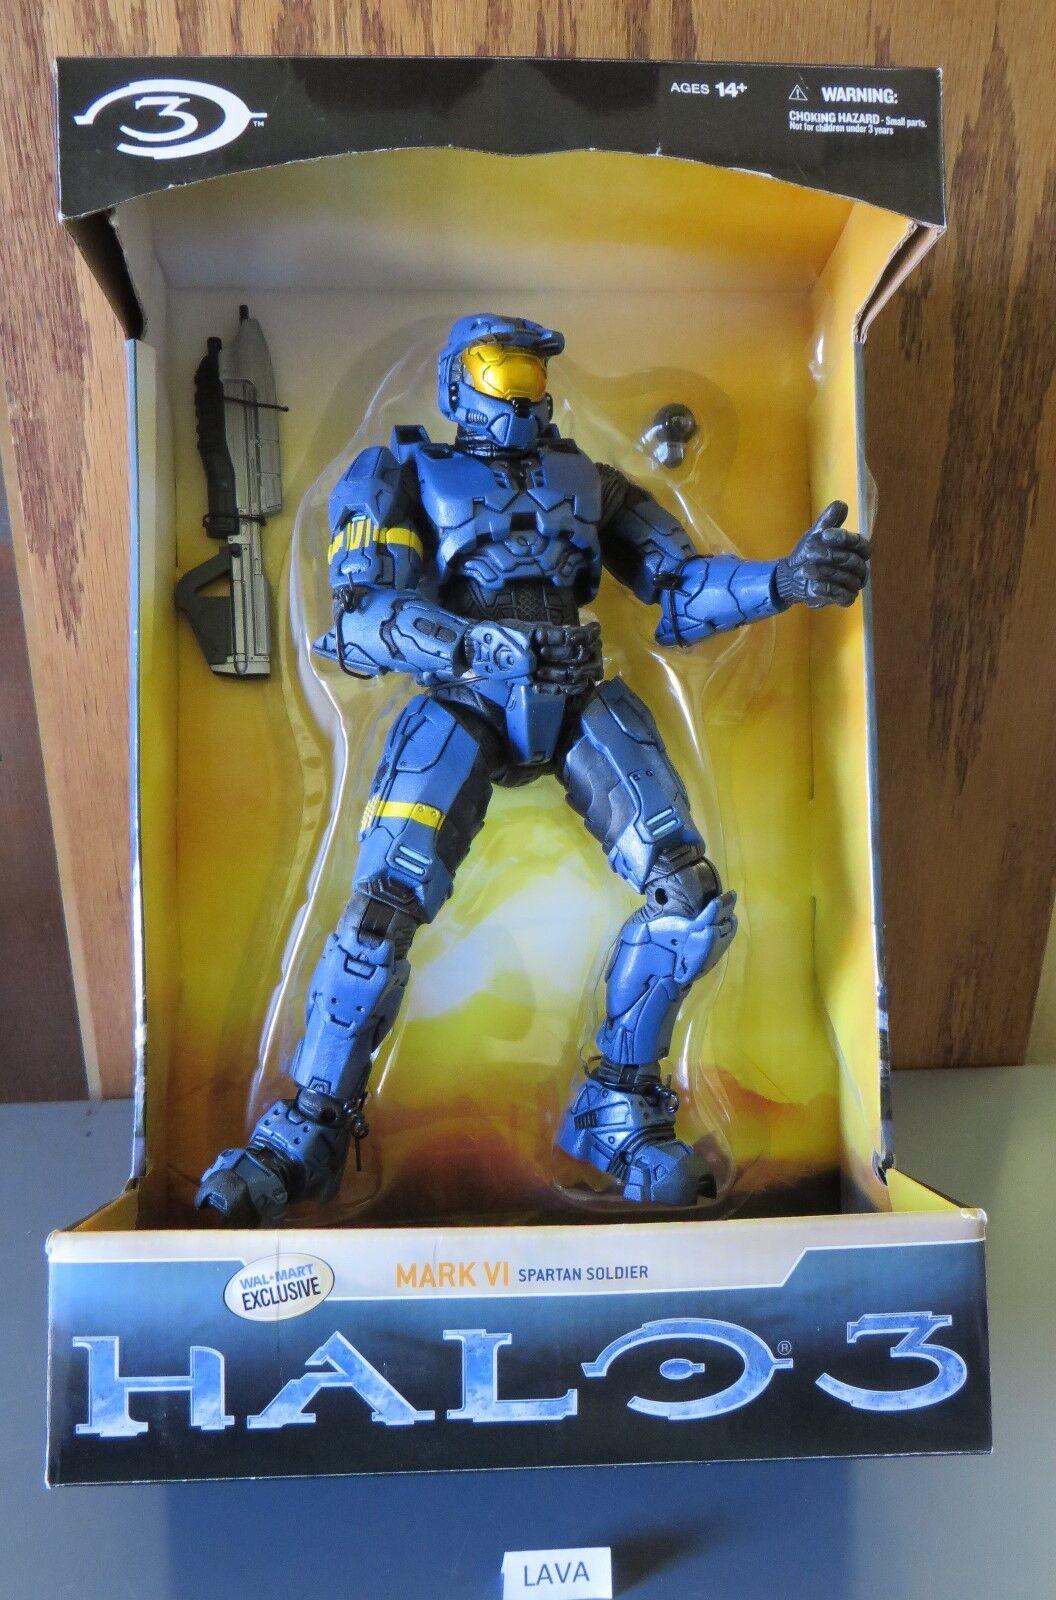 HALO 3 DELUXE blueE MARK VI SPARTAN WALMART EXCLUSIVE ACTION FIGURE MCFARLANE